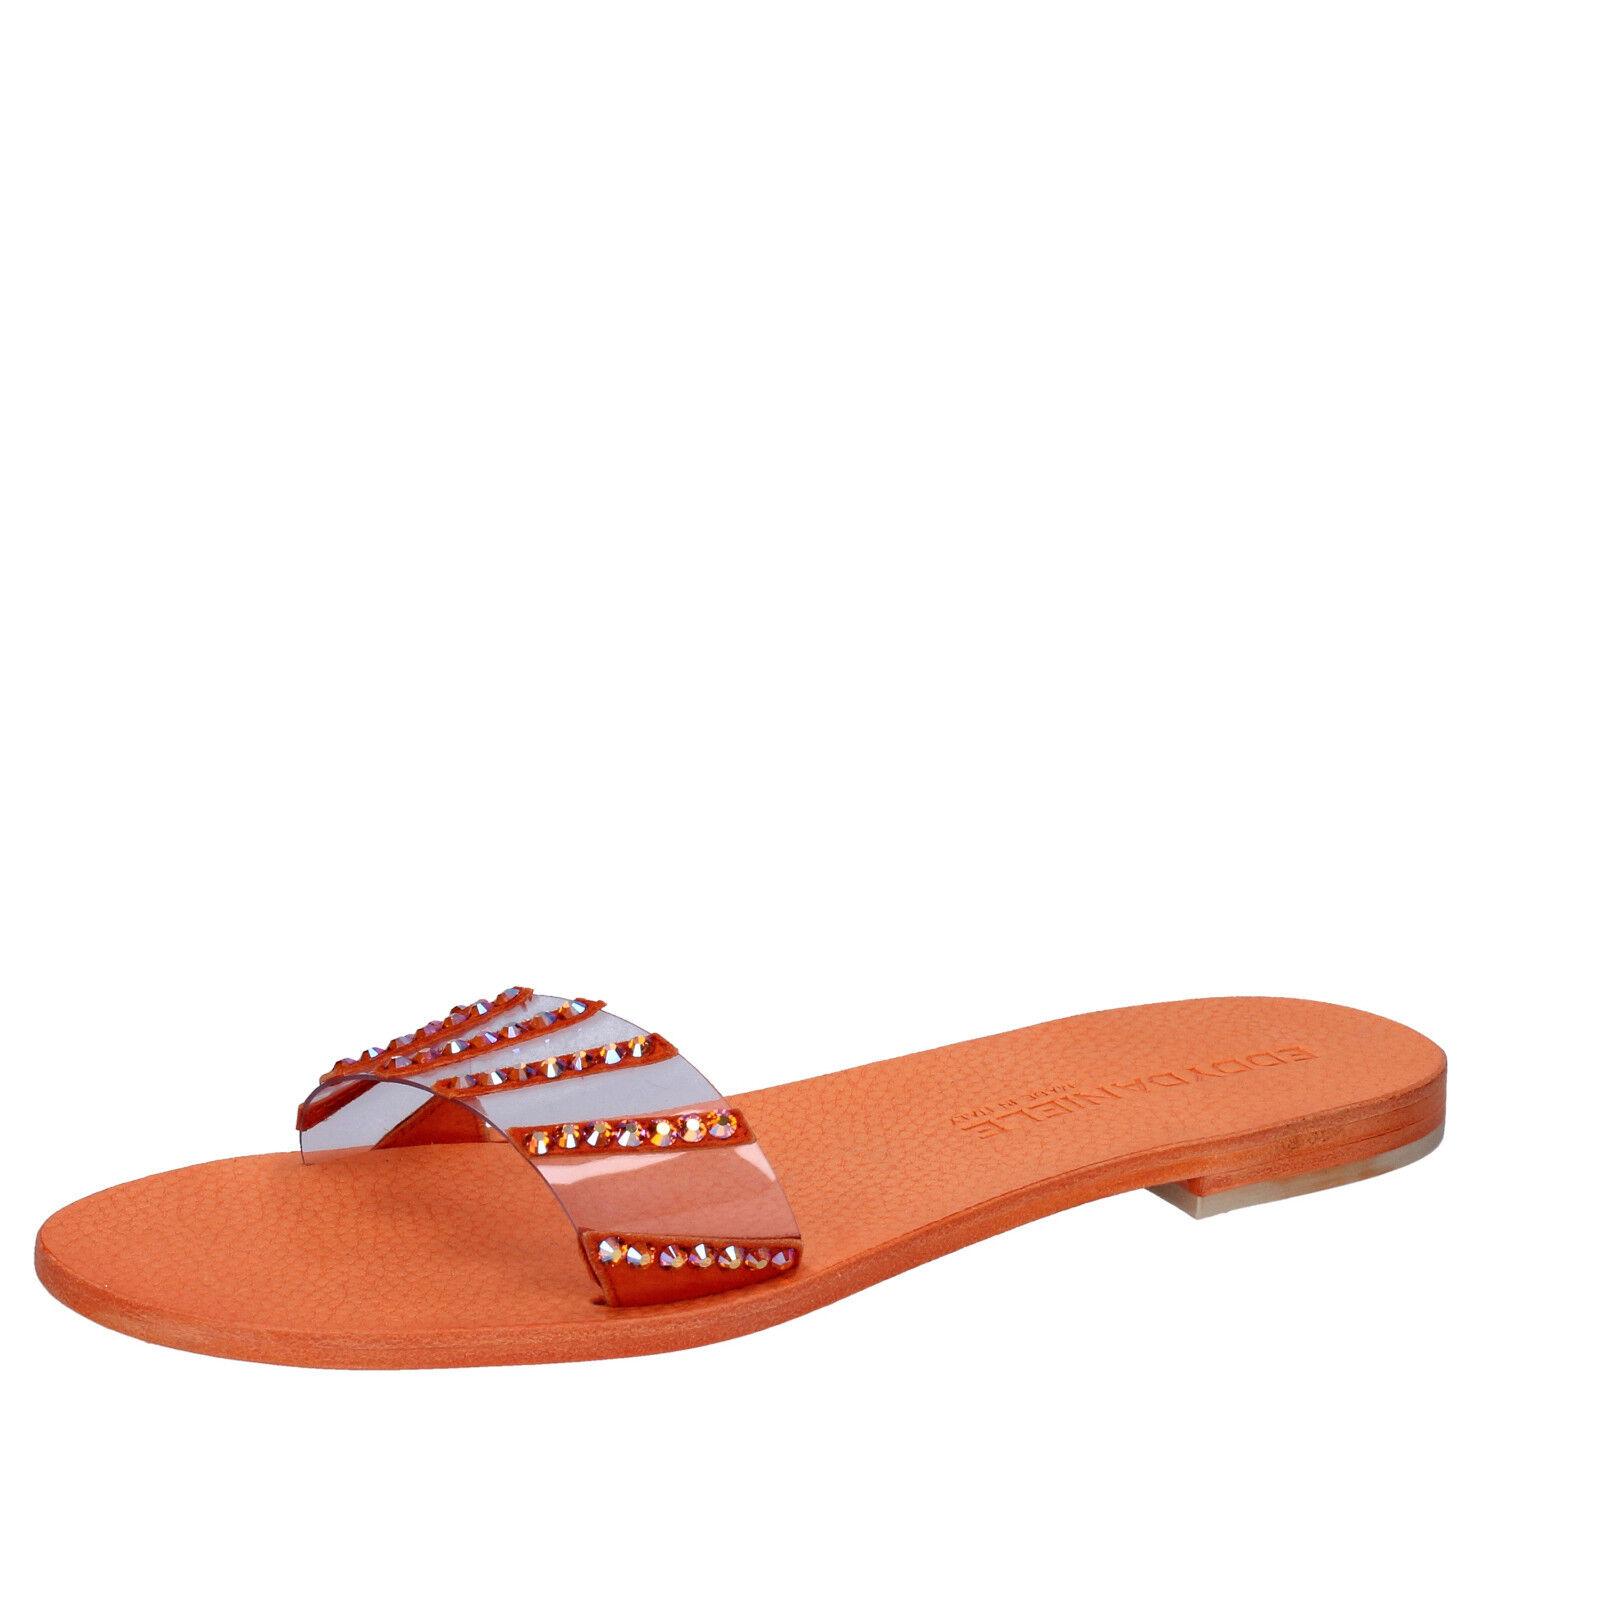 Scarpe donna EDDY DANIELE 37 EU sandali arancione swarovski AW449